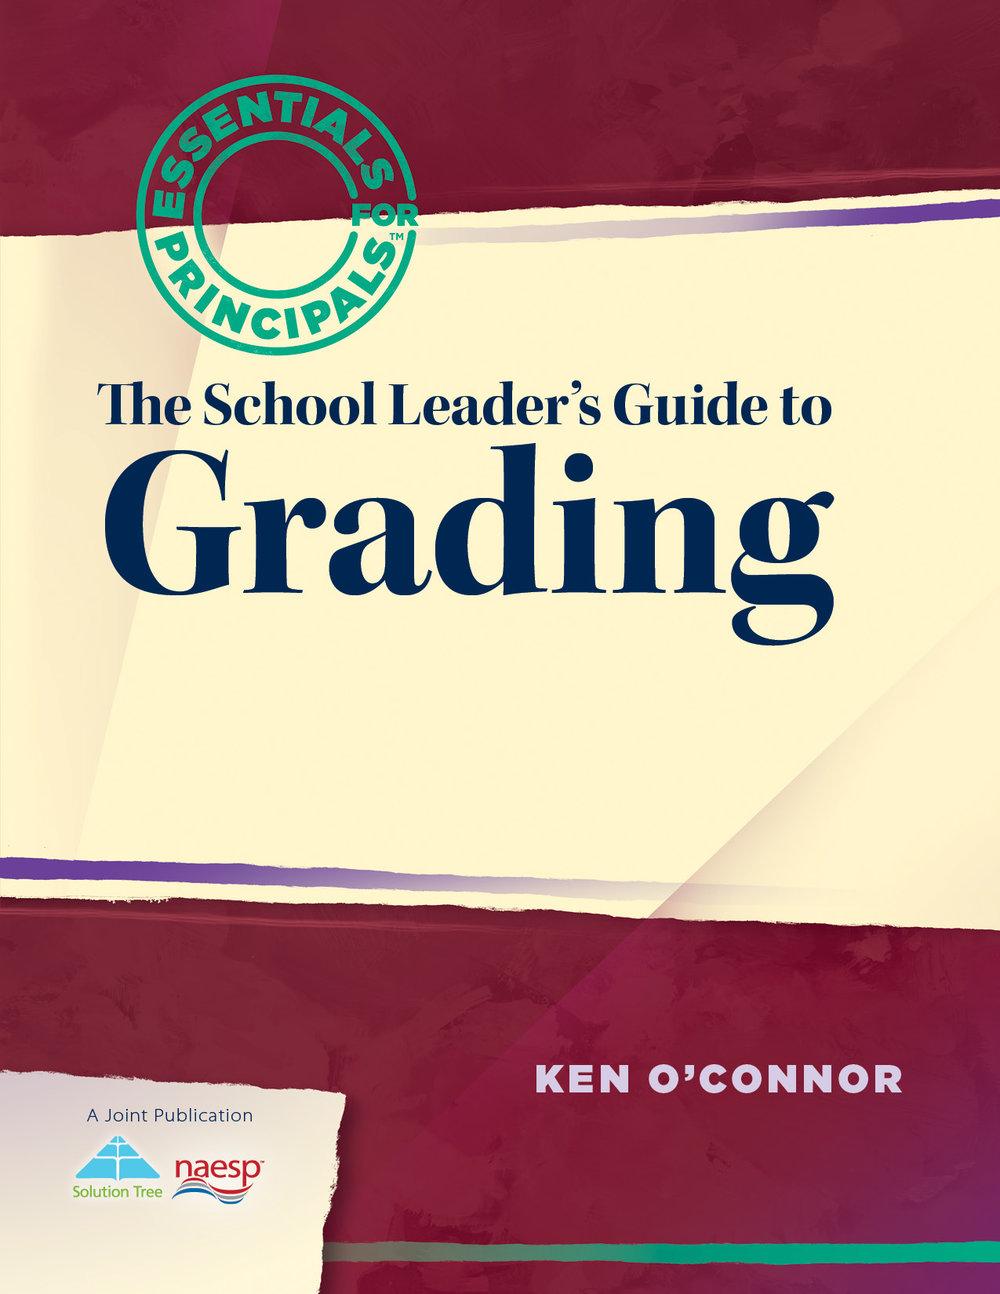 oconnorgrading_kenoconnor_theschoolleadersguidetograding